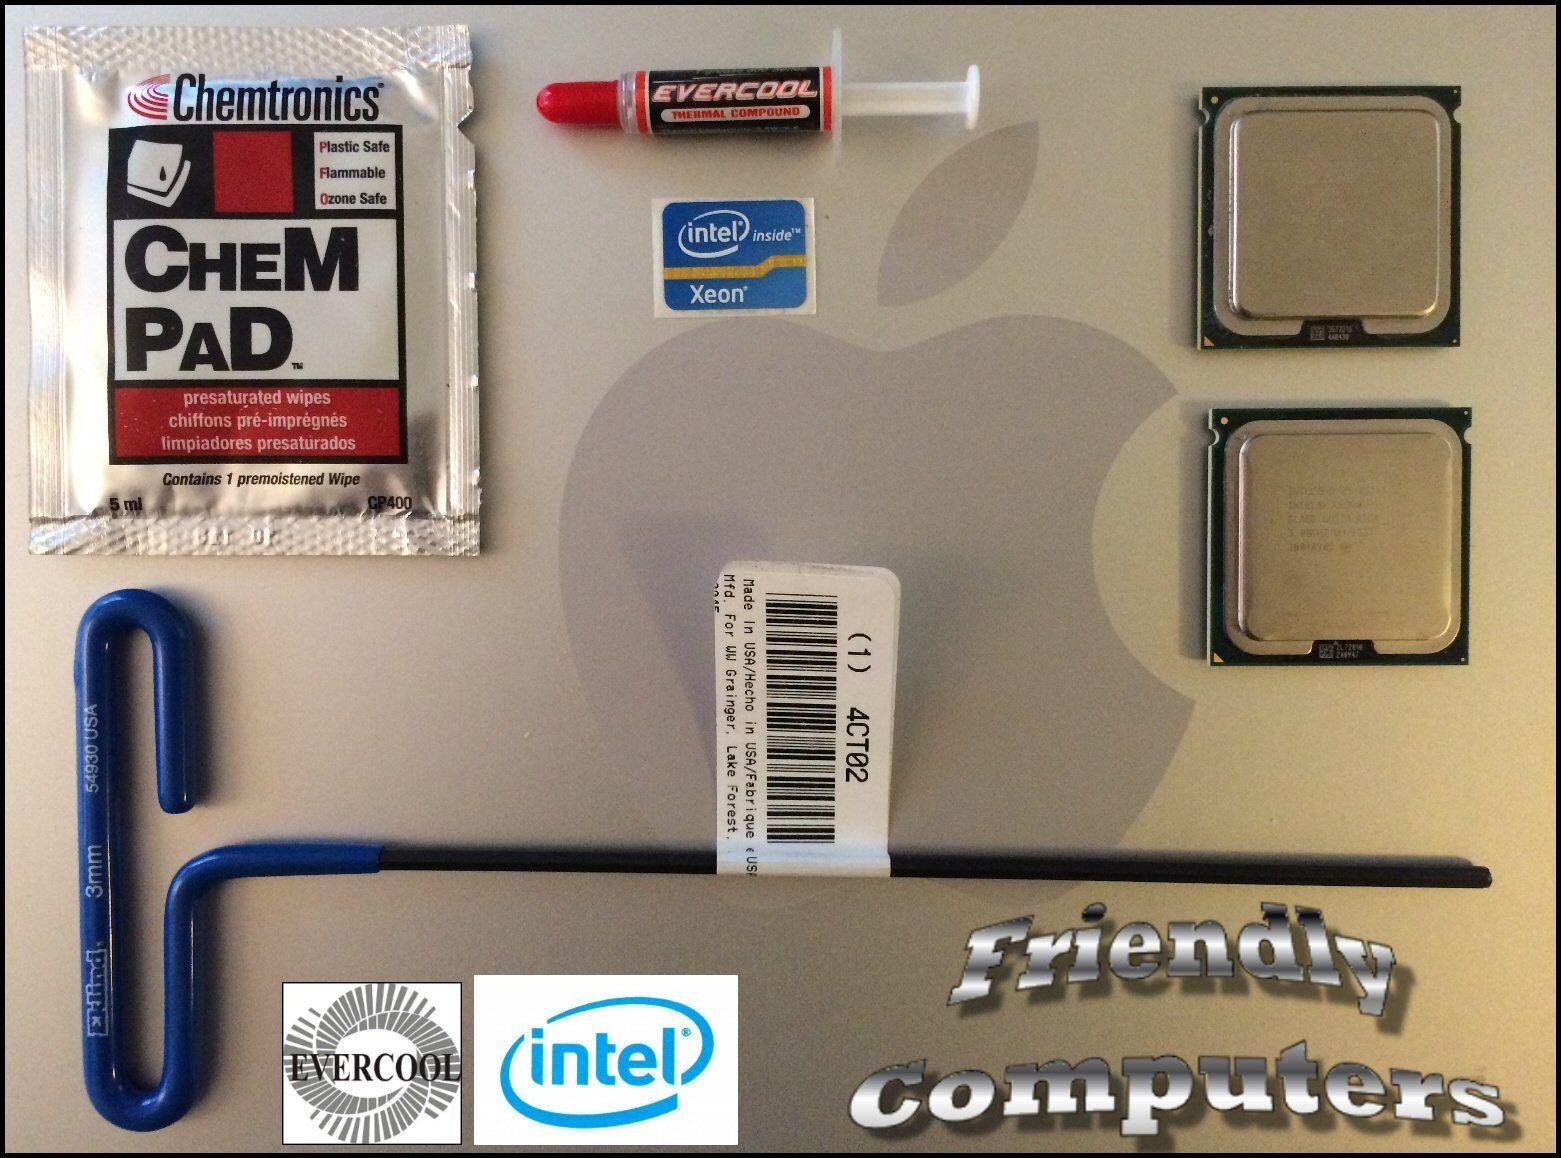 *MAXED* Twelve Core 2010,2012 Apple Mac Pro 5,1 X5690 3.46GHz PROCESSOR CPUs kit